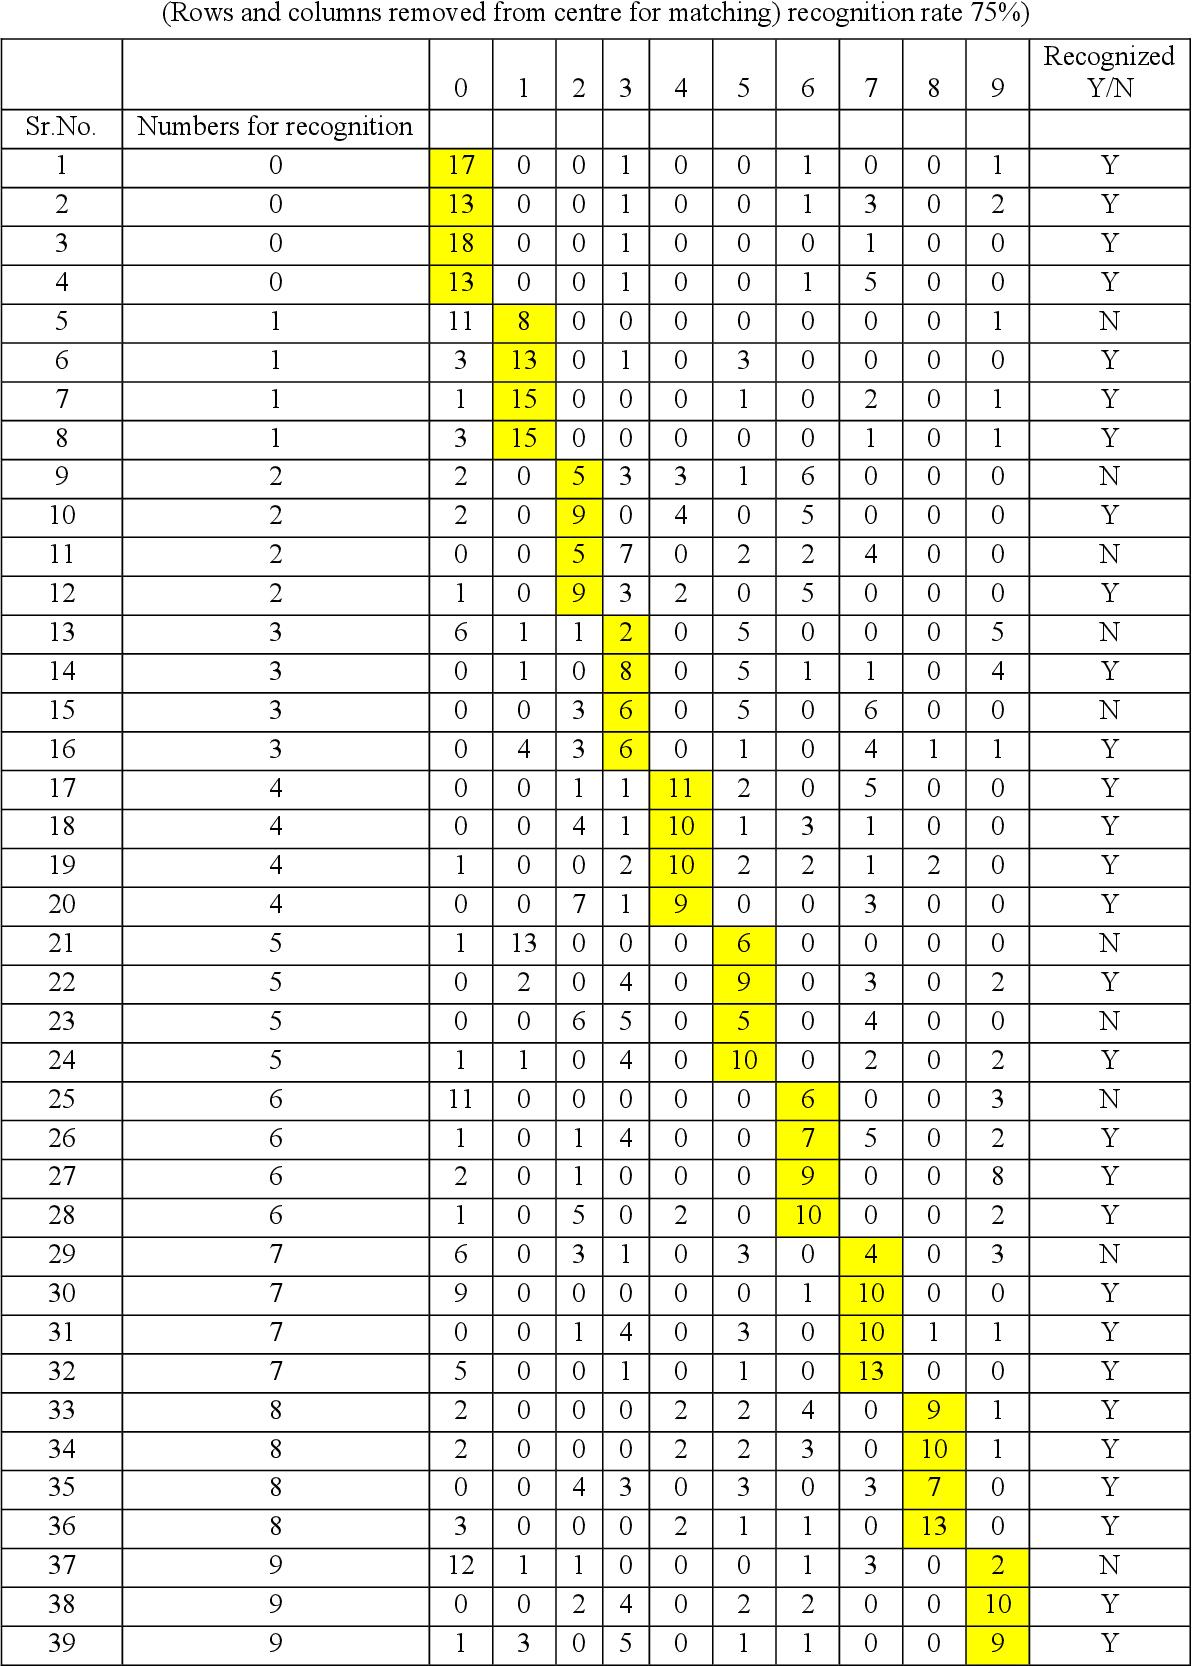 Marathi Numbers : marathi, numbers, Classification, Handwritten, Marathi, Numbers, Using, Euclidean, Distance, Semantic, Scholar